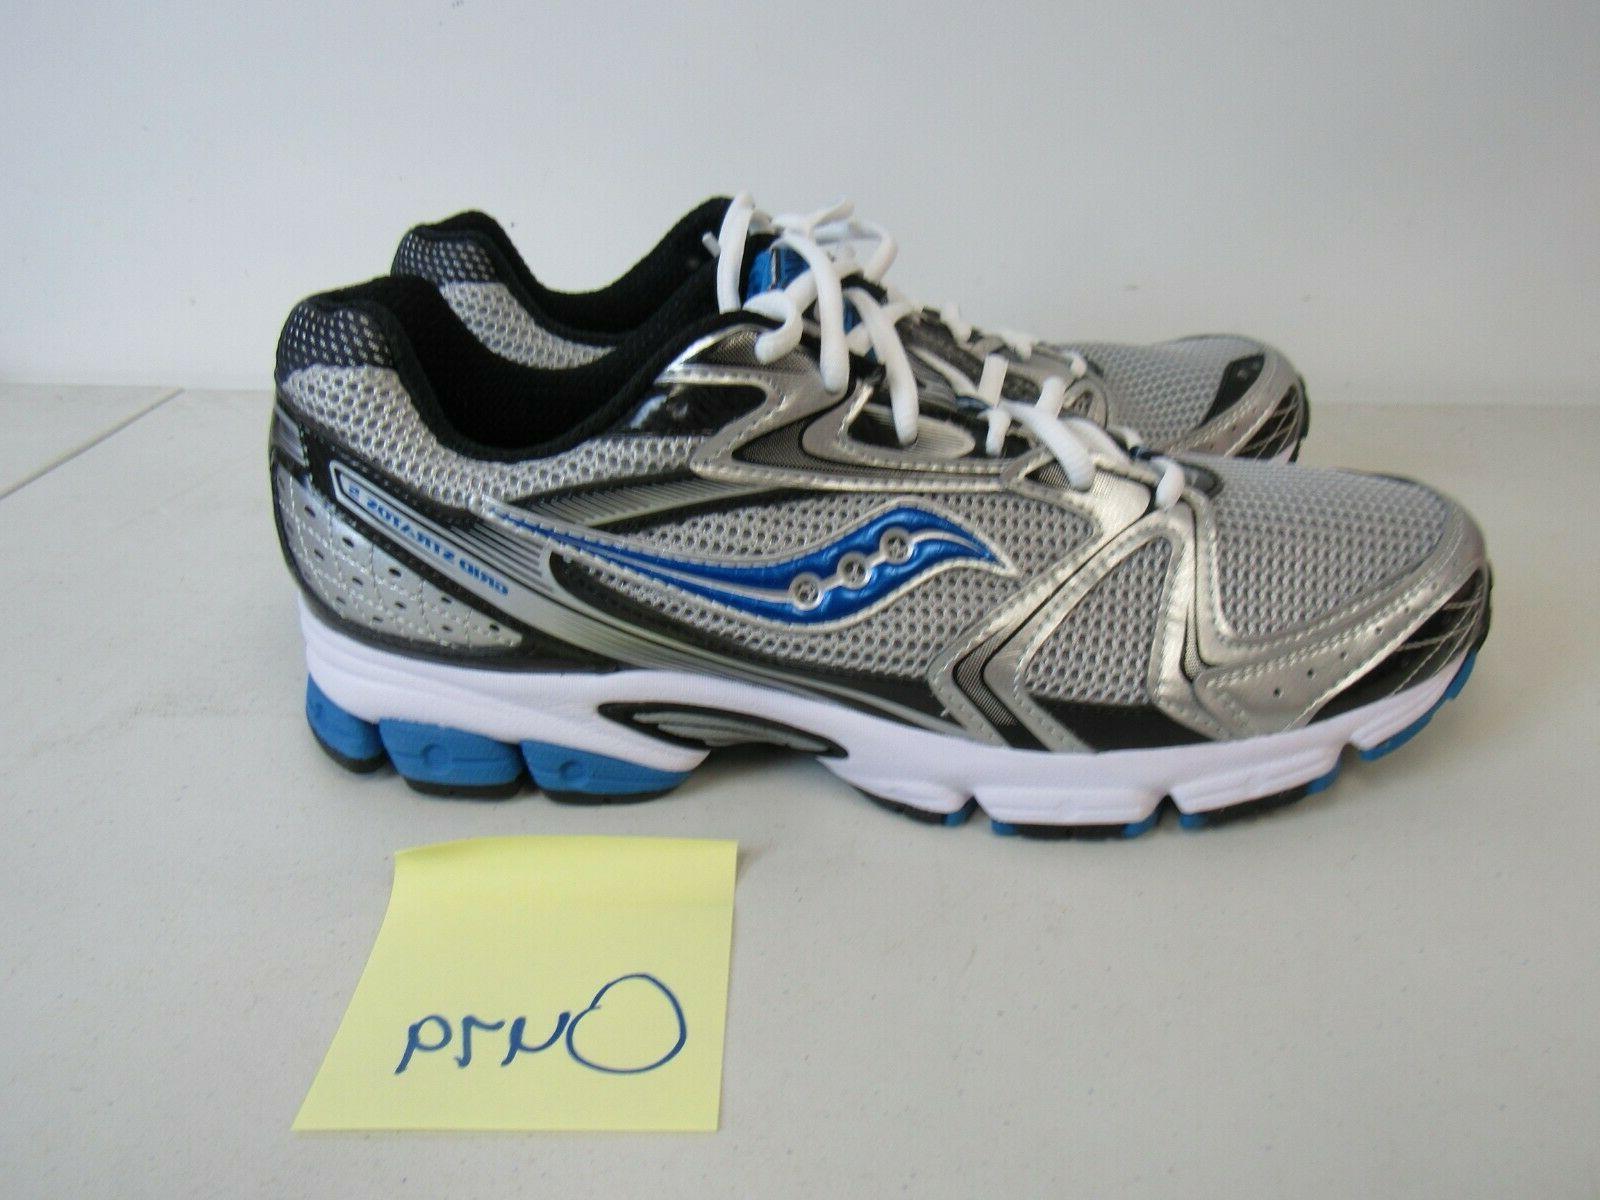 grid stratos 5 mens running sneakers sz